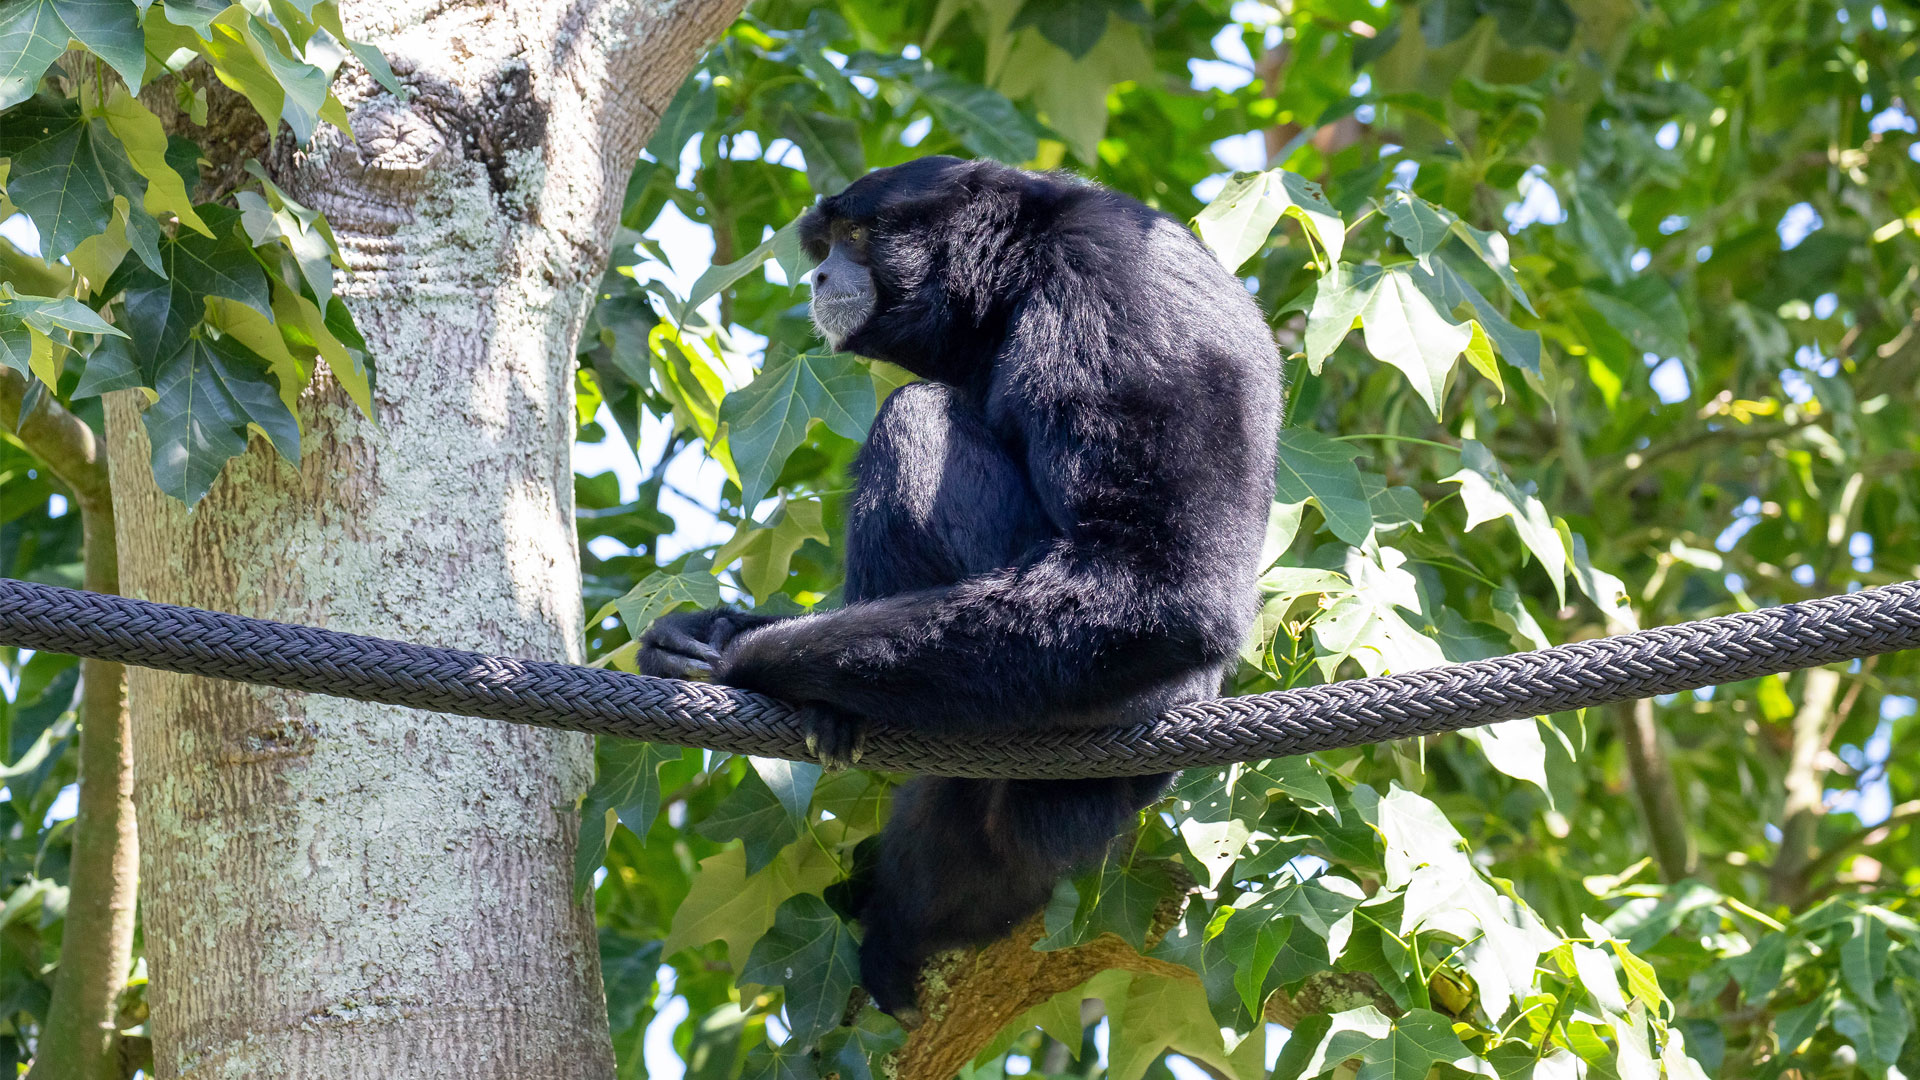 https://rfacdn.nz/zoo/assets/media/siamang-gibbon-gallery-2.jpg